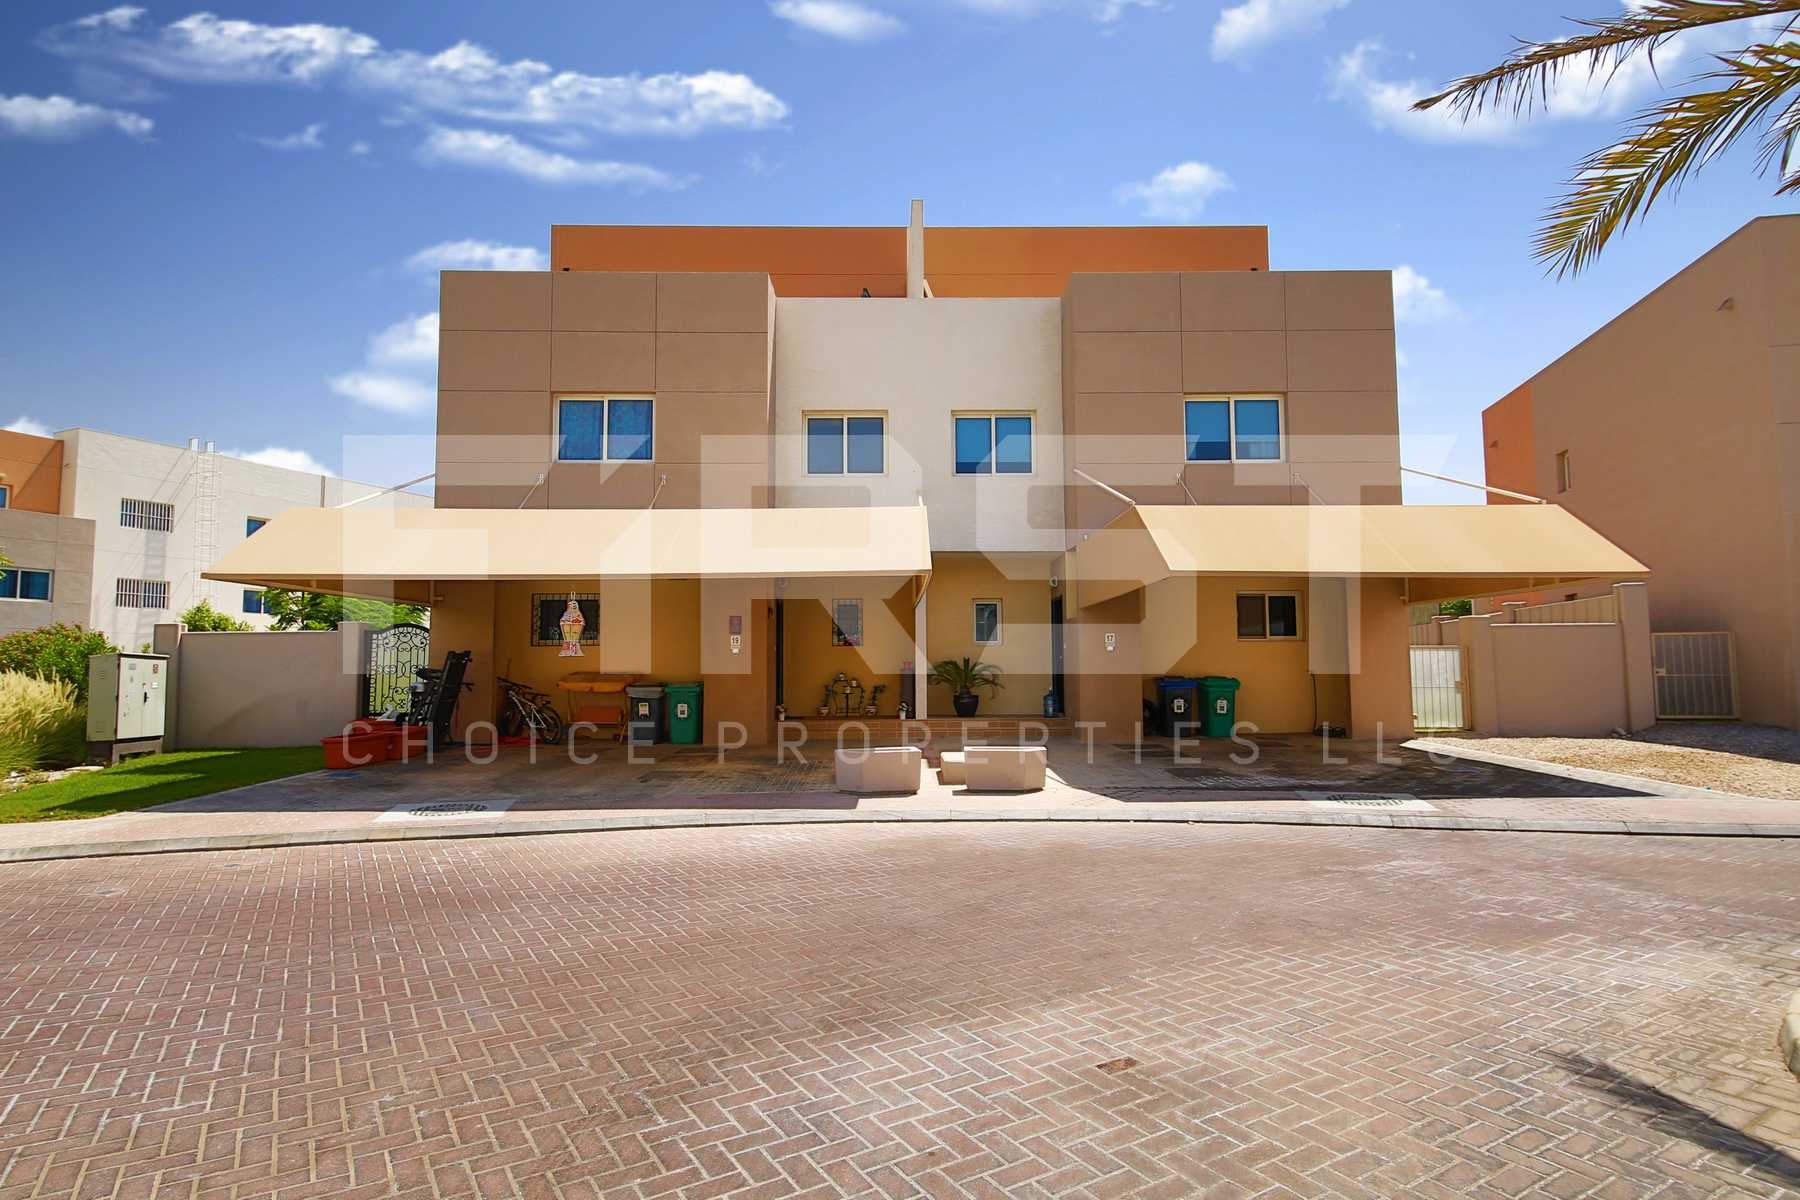 External Photo of Contemporary Village Al Reef Villas Al Reef Abu Dhabi UAE (20).jpg